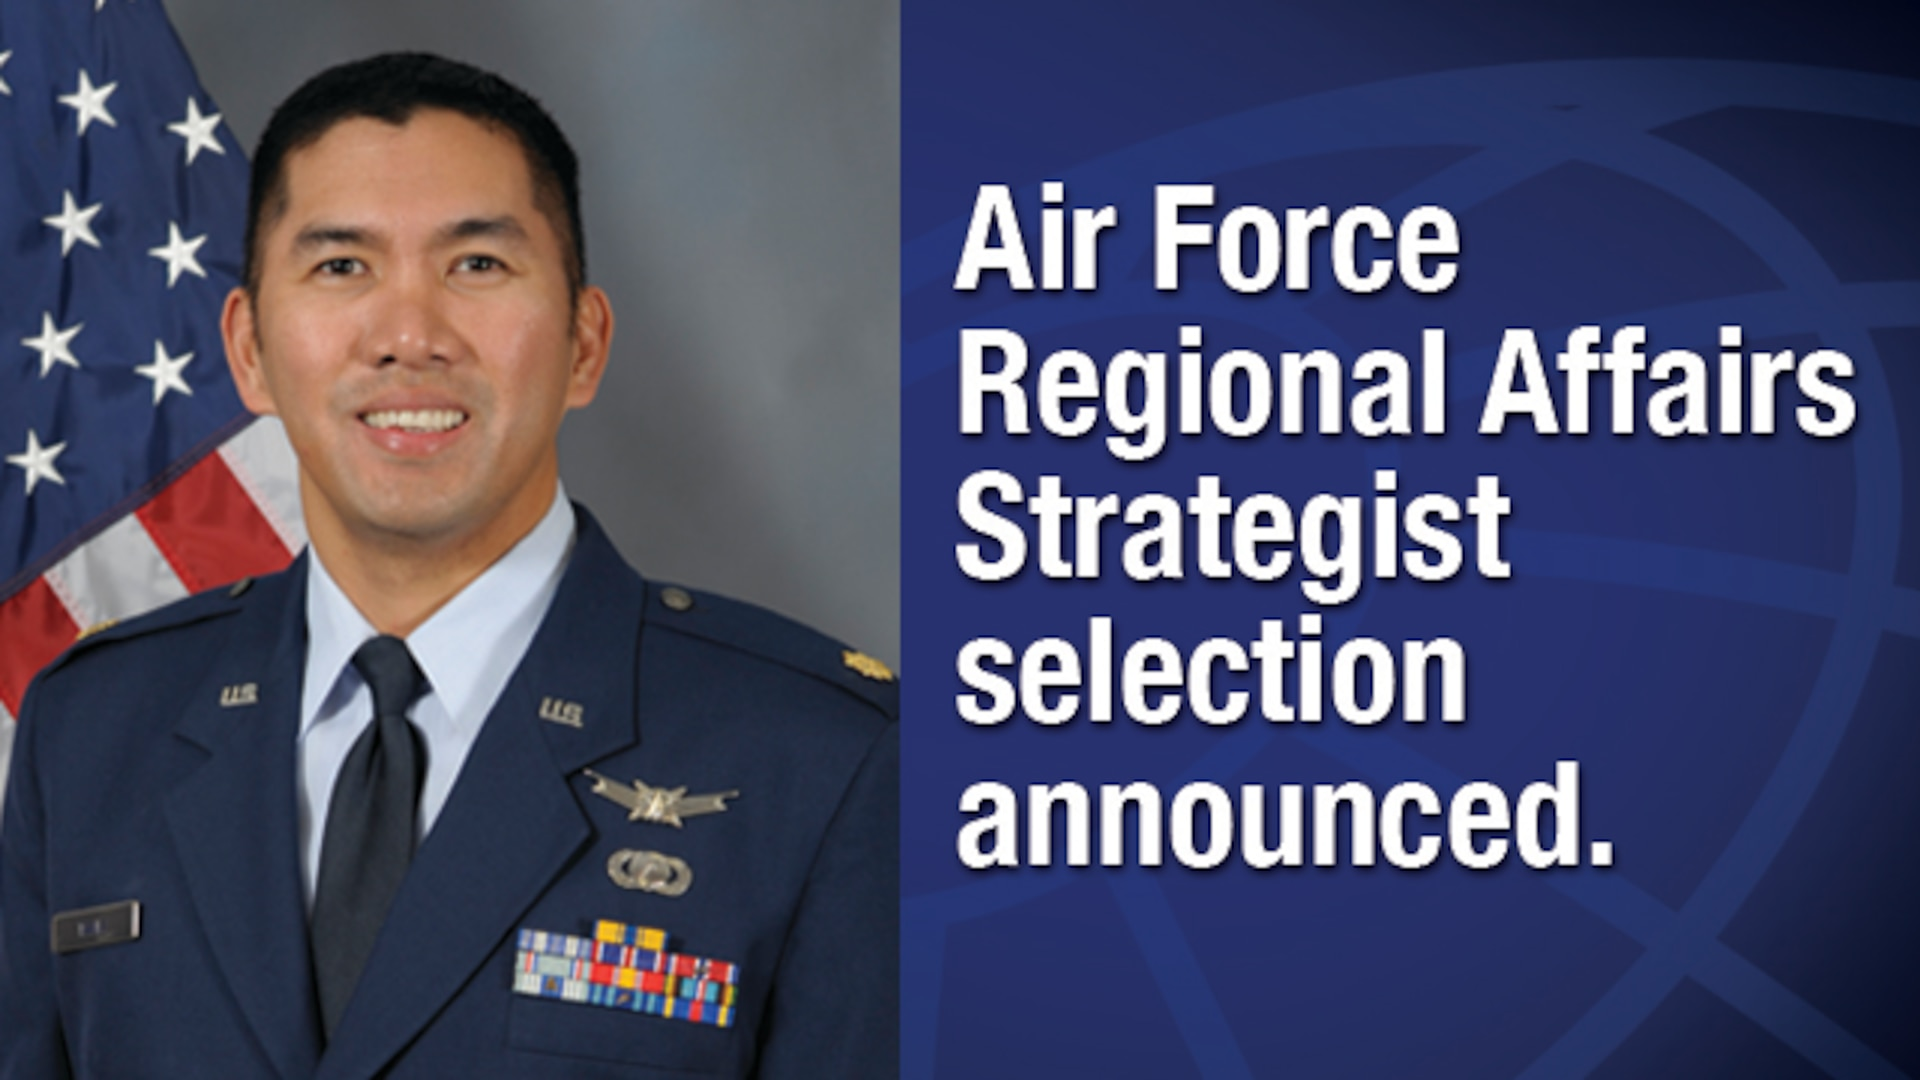 DCMA Lockheed Martin Orlando employee selected for immersive Air Force Regional Affairs Strategist program.